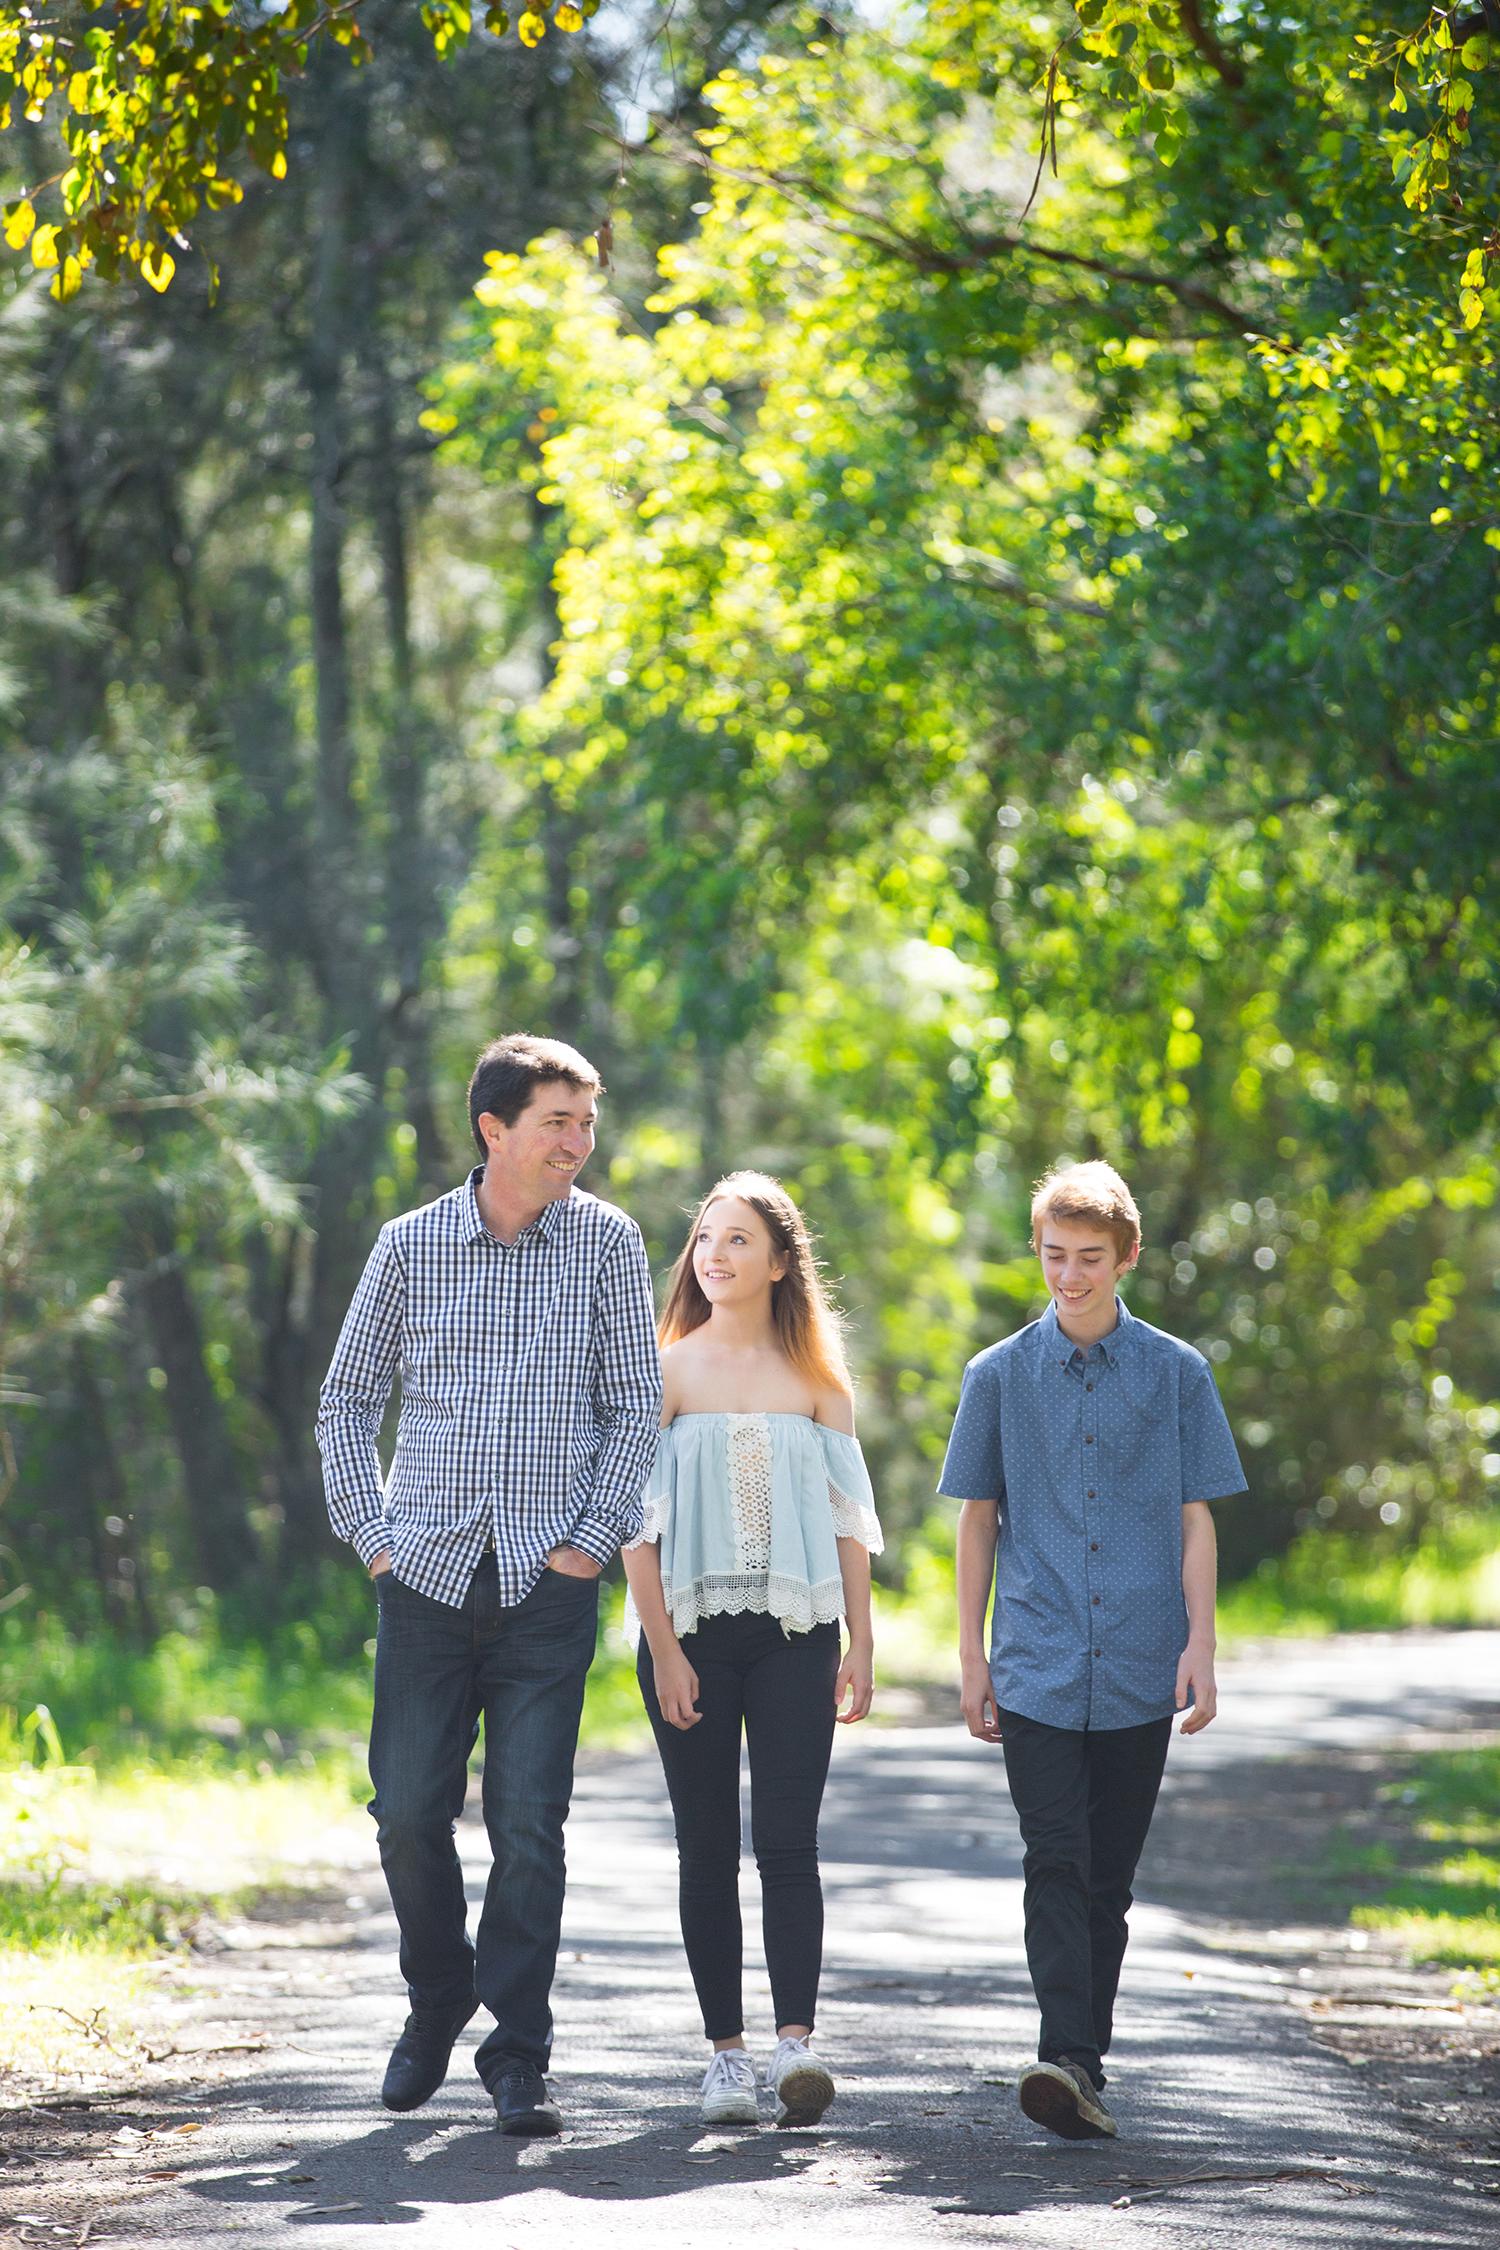 Sydney Family Photographer - Jennifer Lam Photography (25).jpg